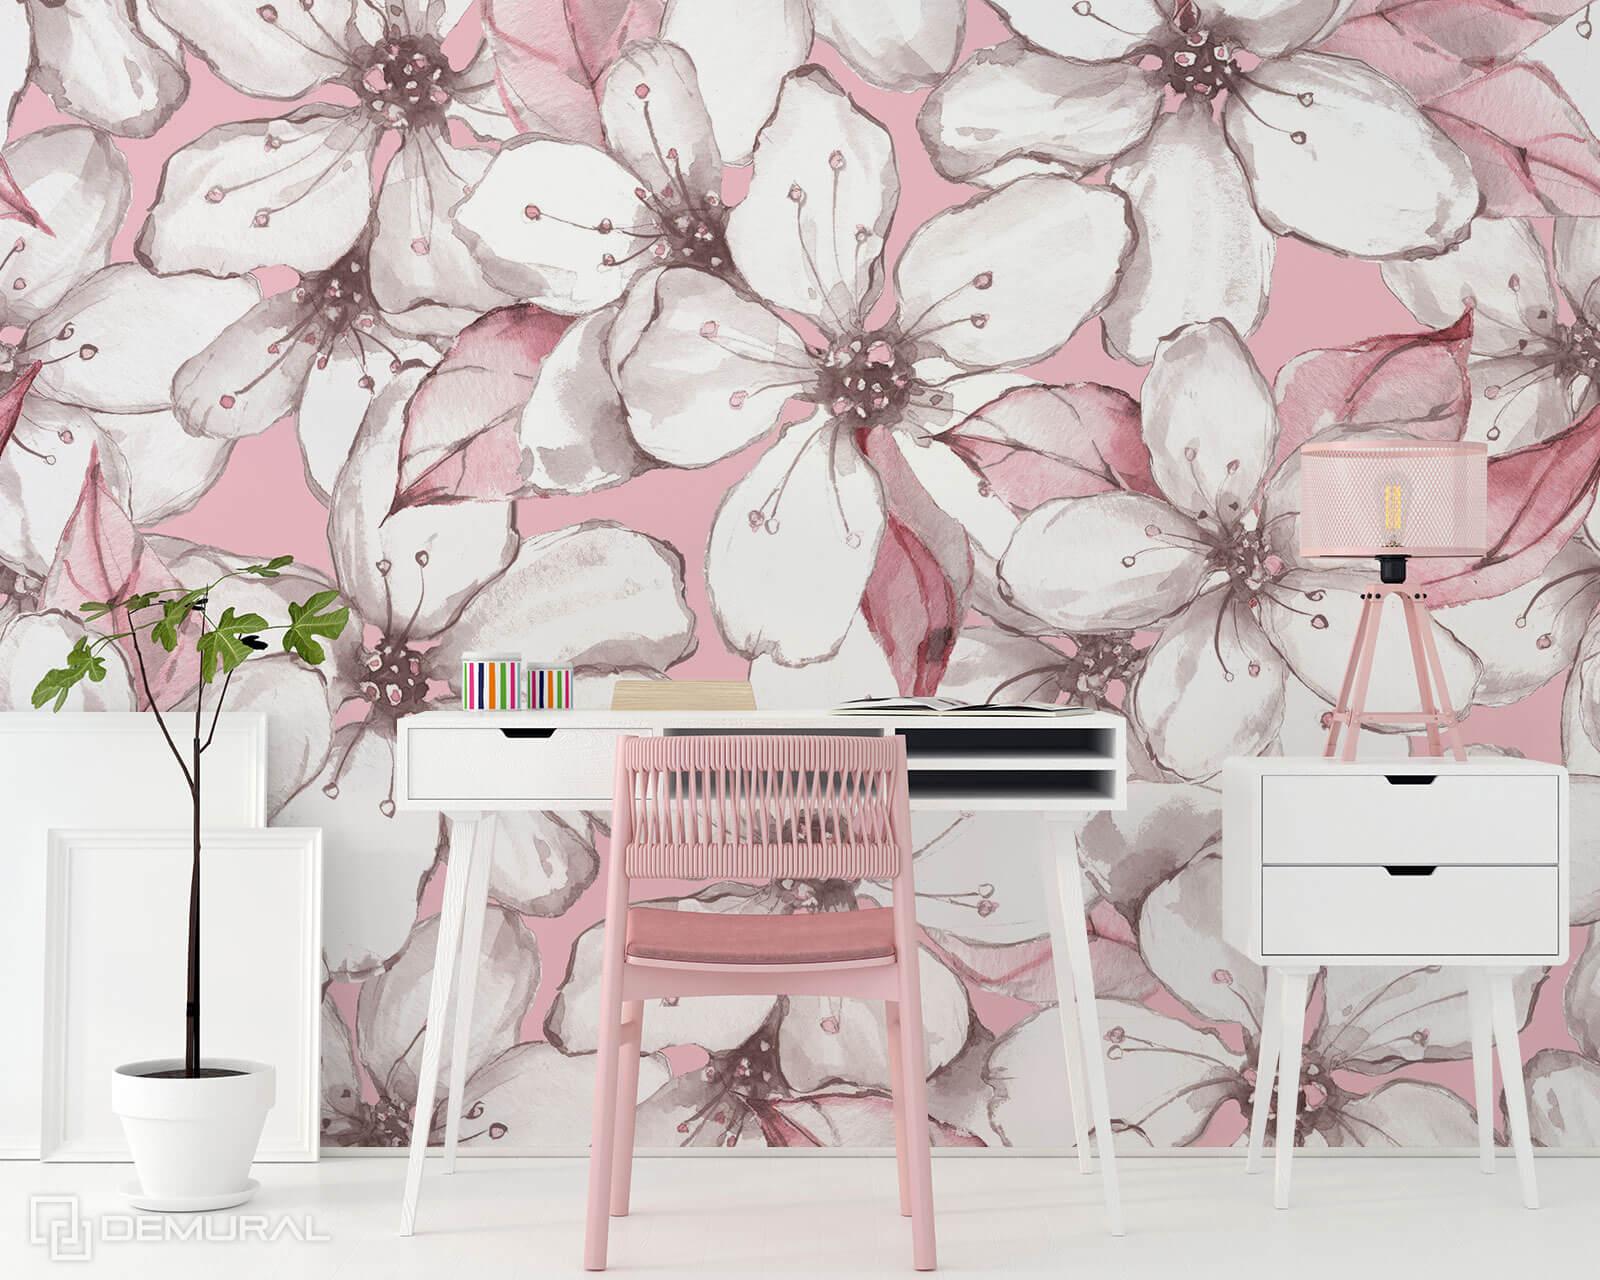 Photo wallpaper Apple blossoms - Pink photo wallpaper - Demural